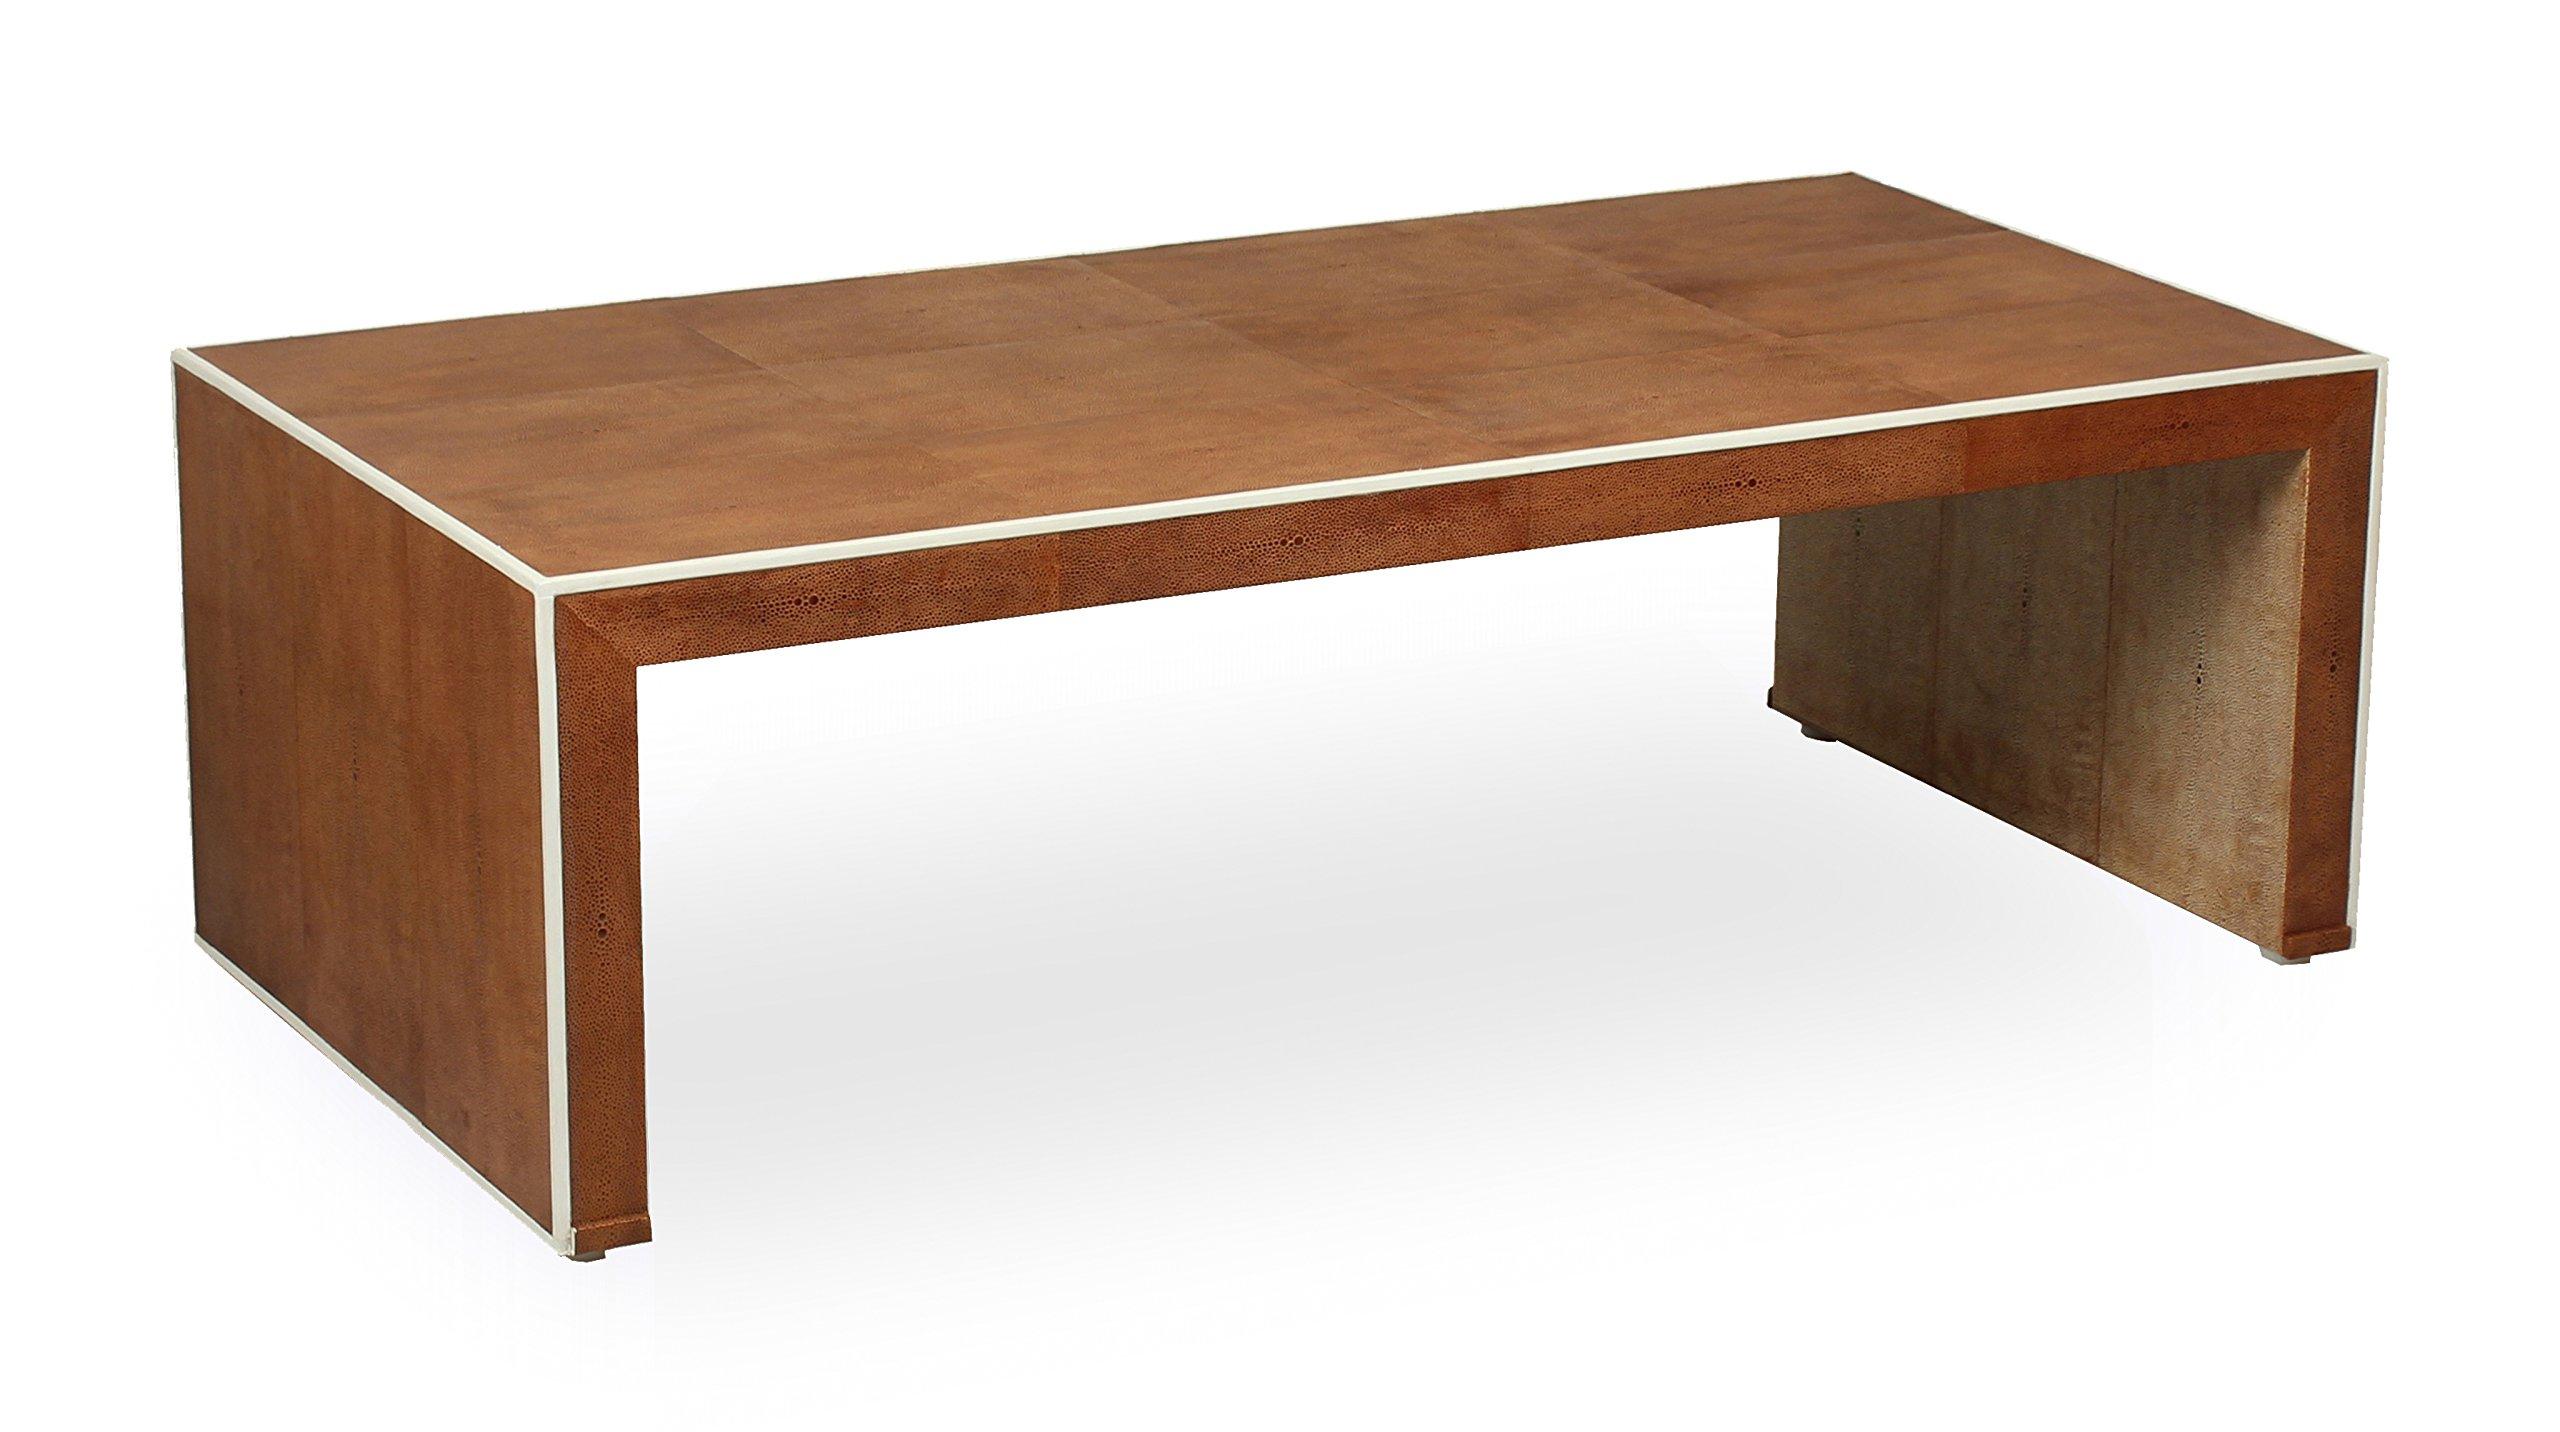 Sarreid 40133 Shagreen Coffee Table, Low Tan